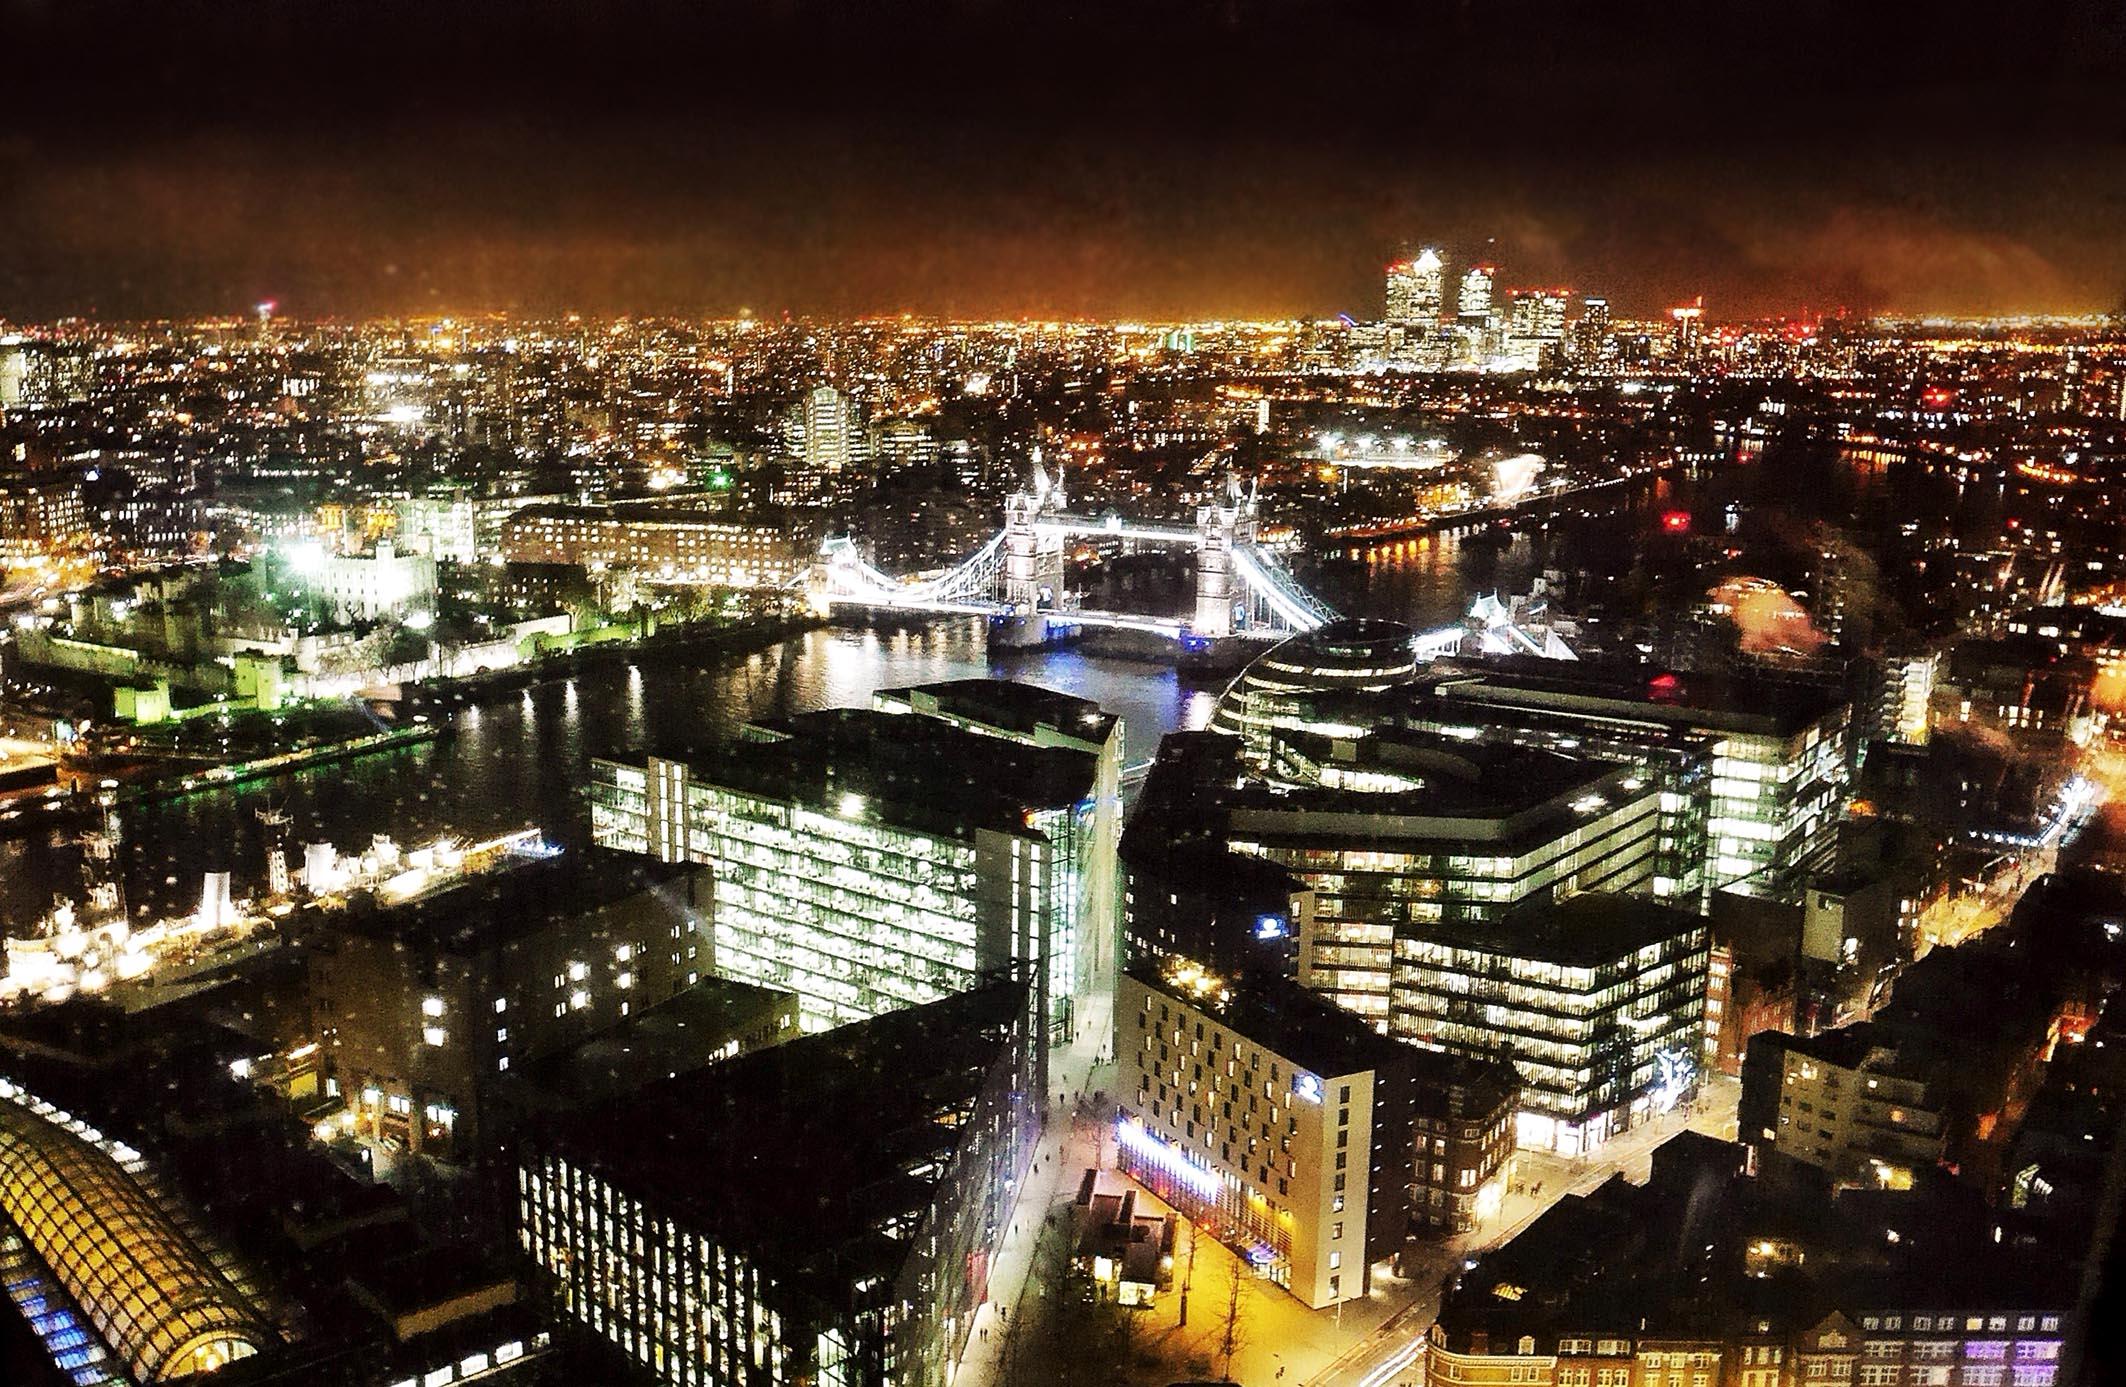 Night scene of London